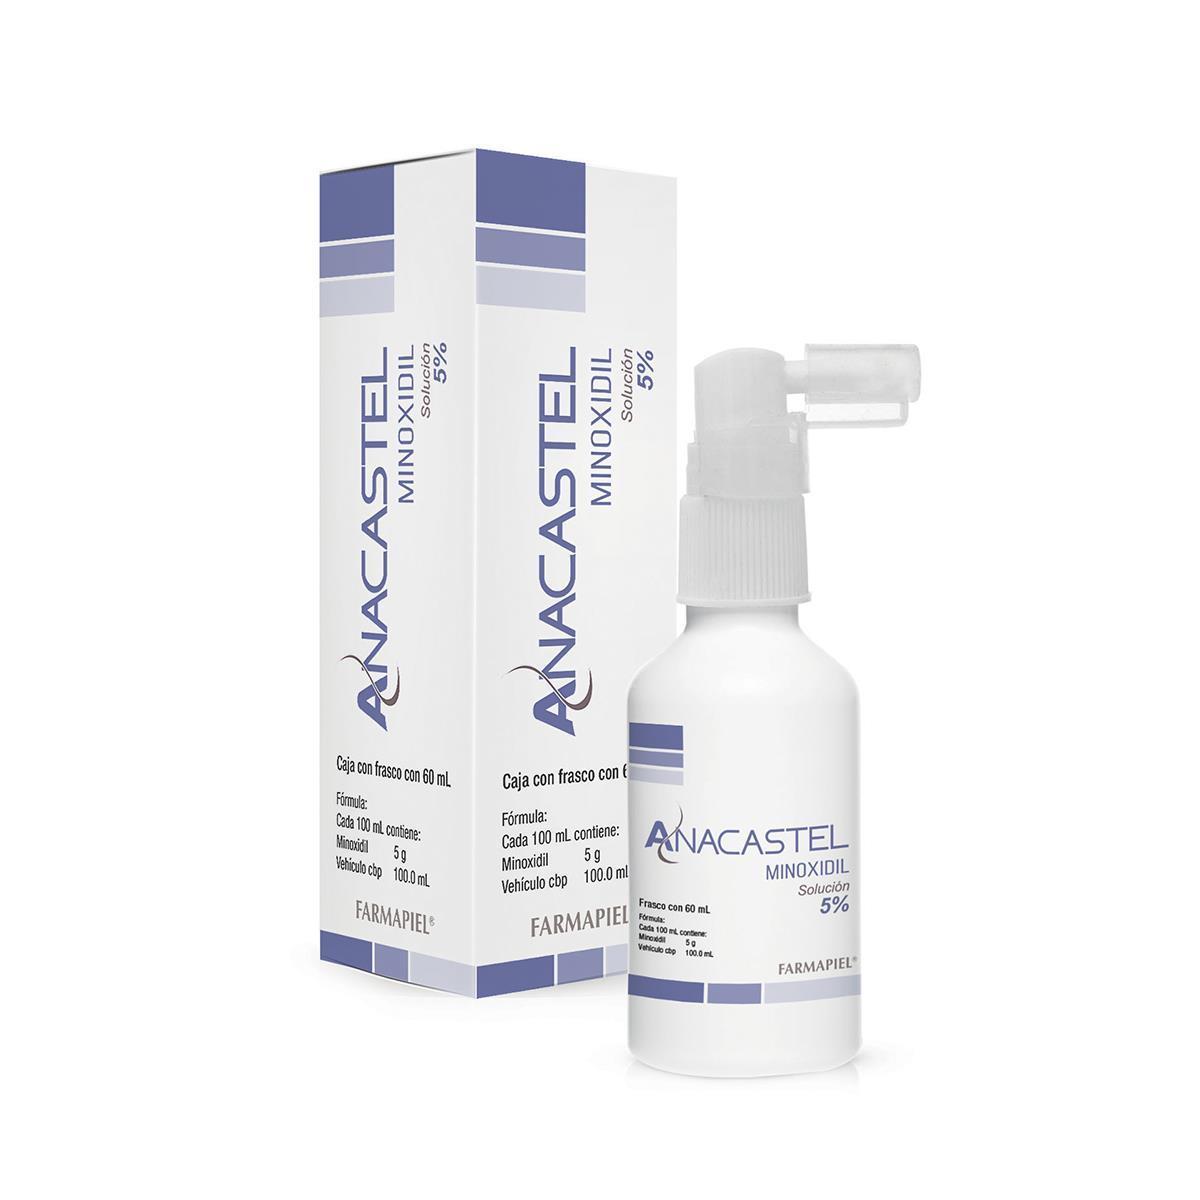 Anacastel Minoxidil 5.0% 60Ml Vr